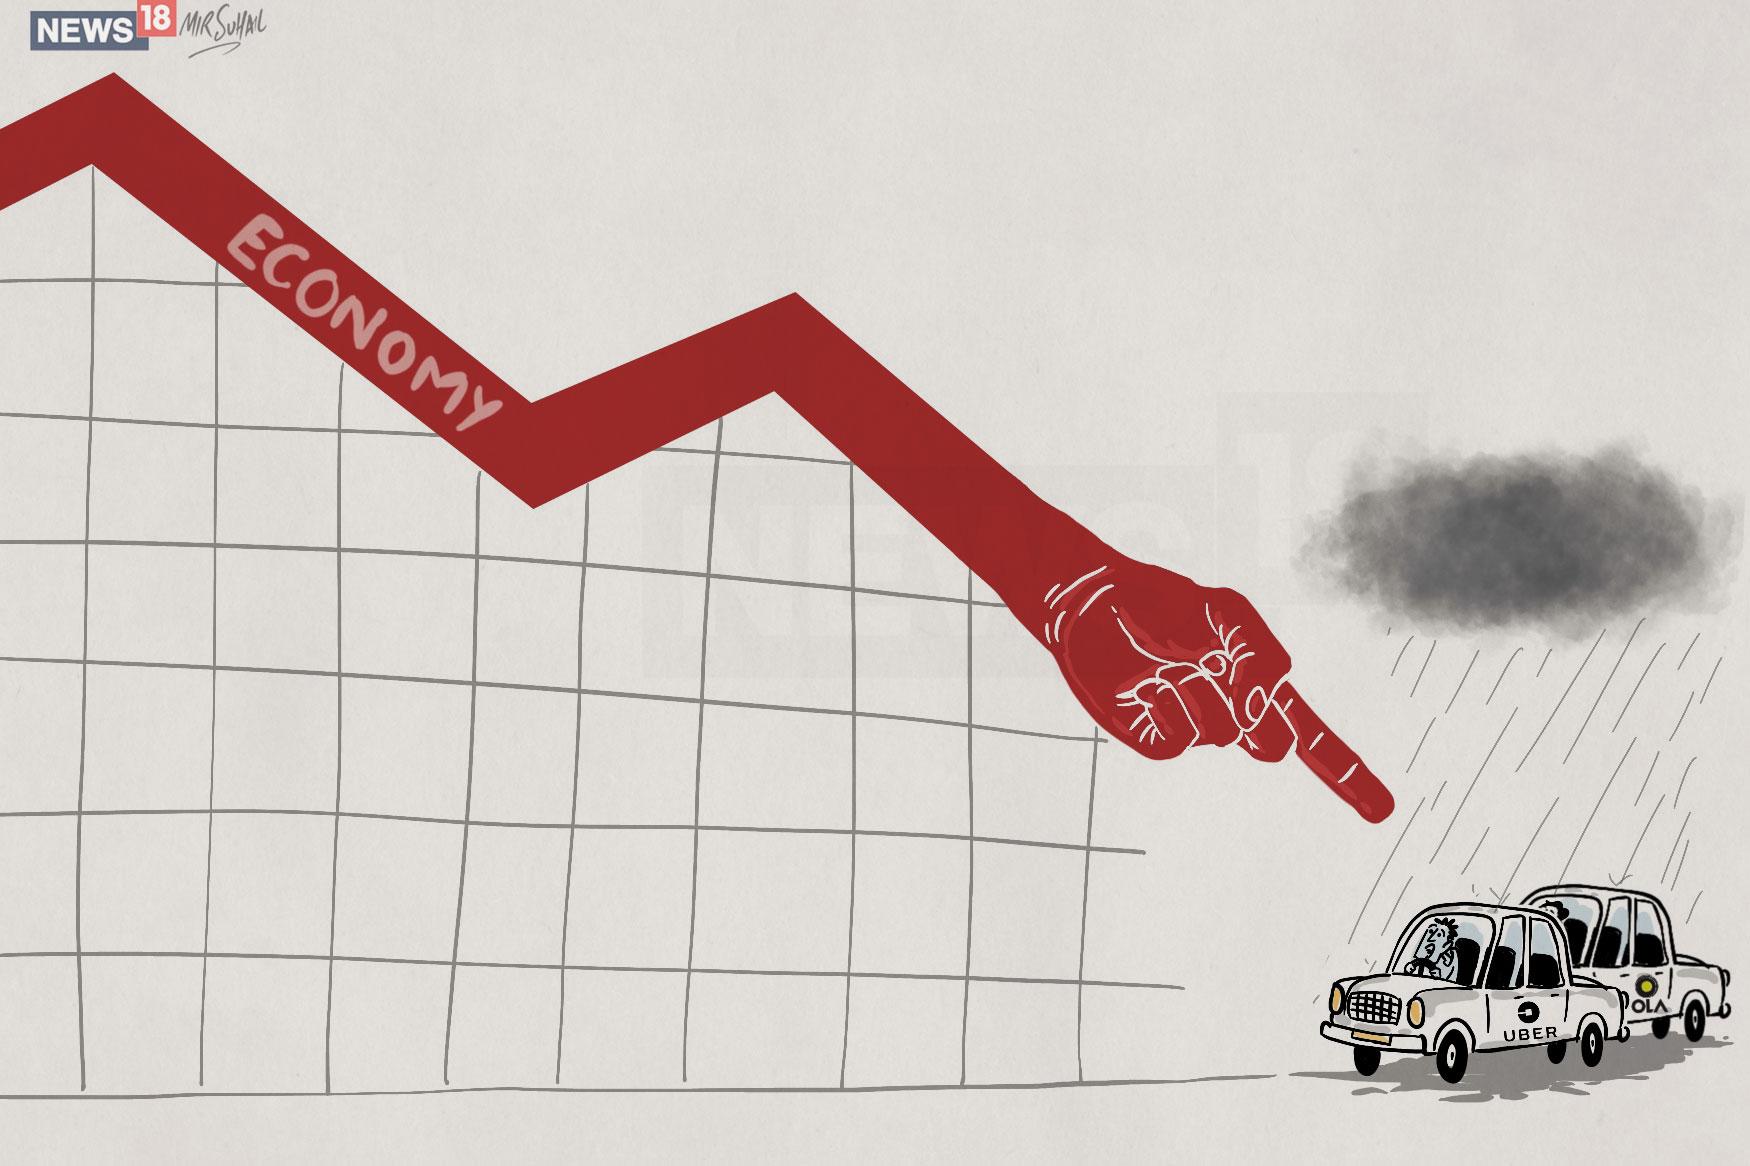 Day after Sitharaman's Millennial Remark, Maruti Suzuki Says Opting for Ola, Uber Not Big Factor Slowdown